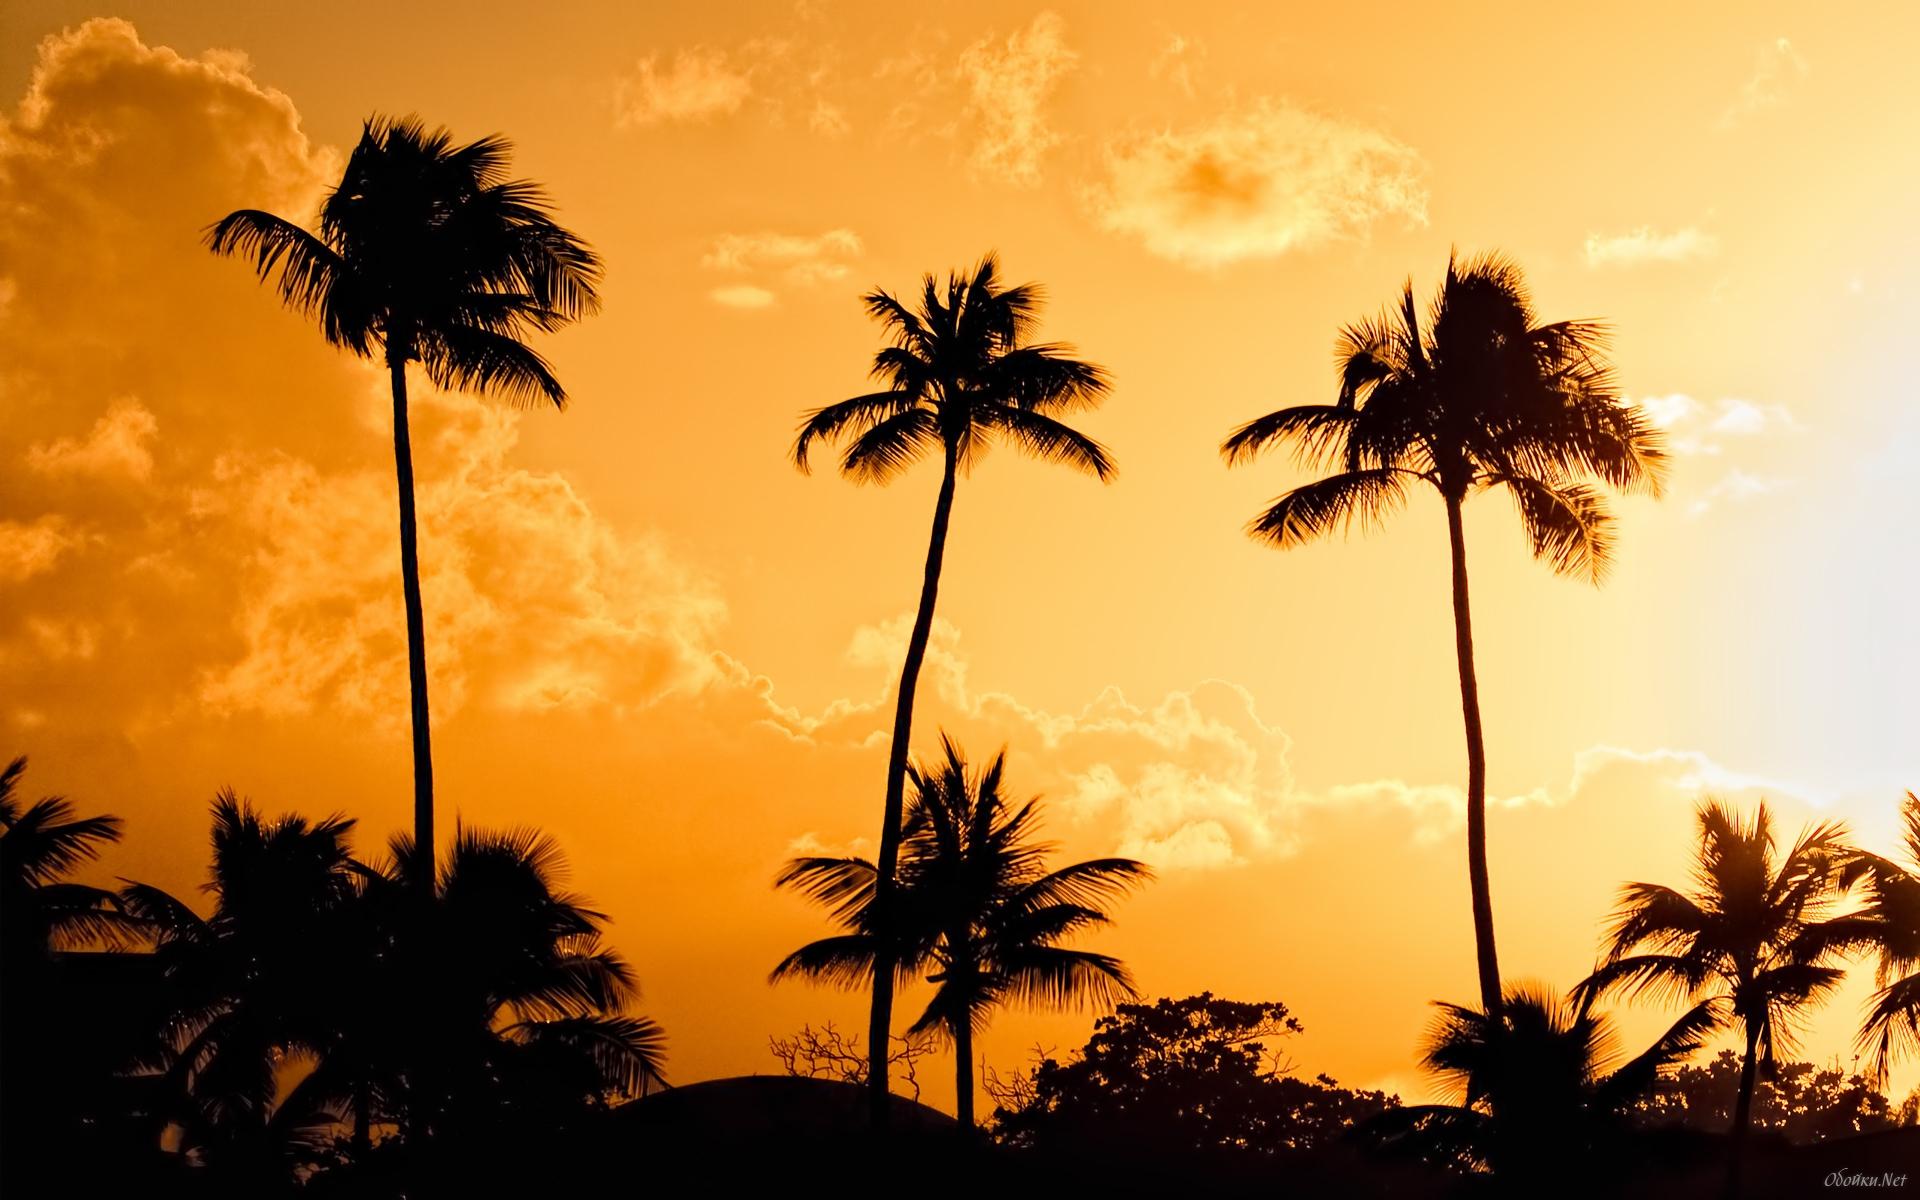 Palm trees at sunset background wallpaper HD Desktop Wallpaper 1920x1200